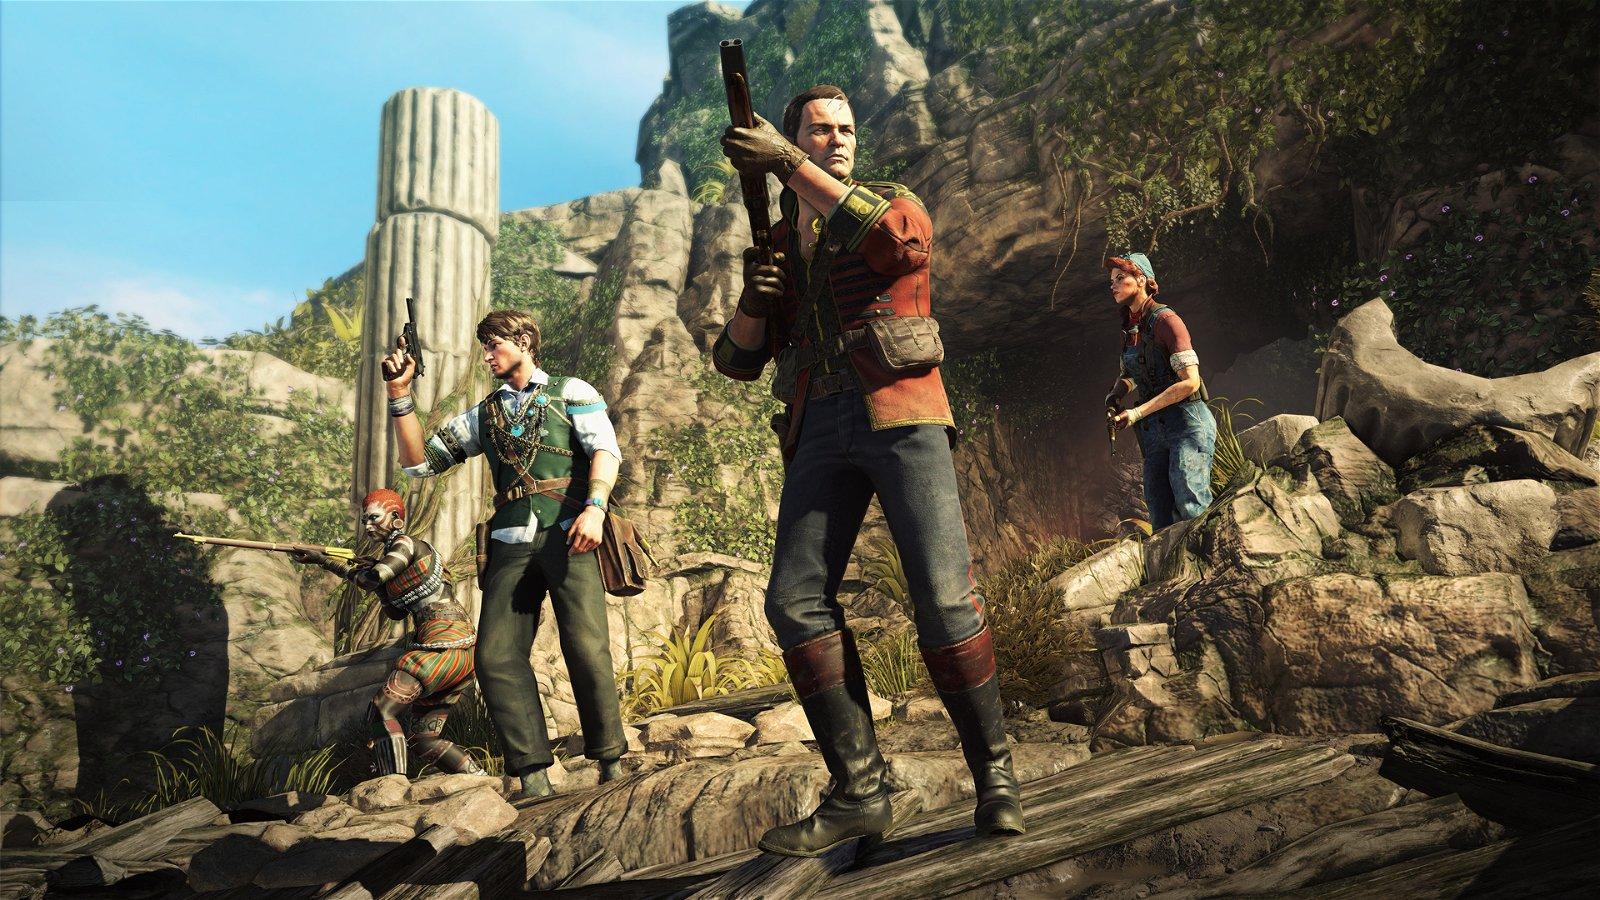 Rebellion Announces Latest 4 Player Action Game, Strange Brigade.